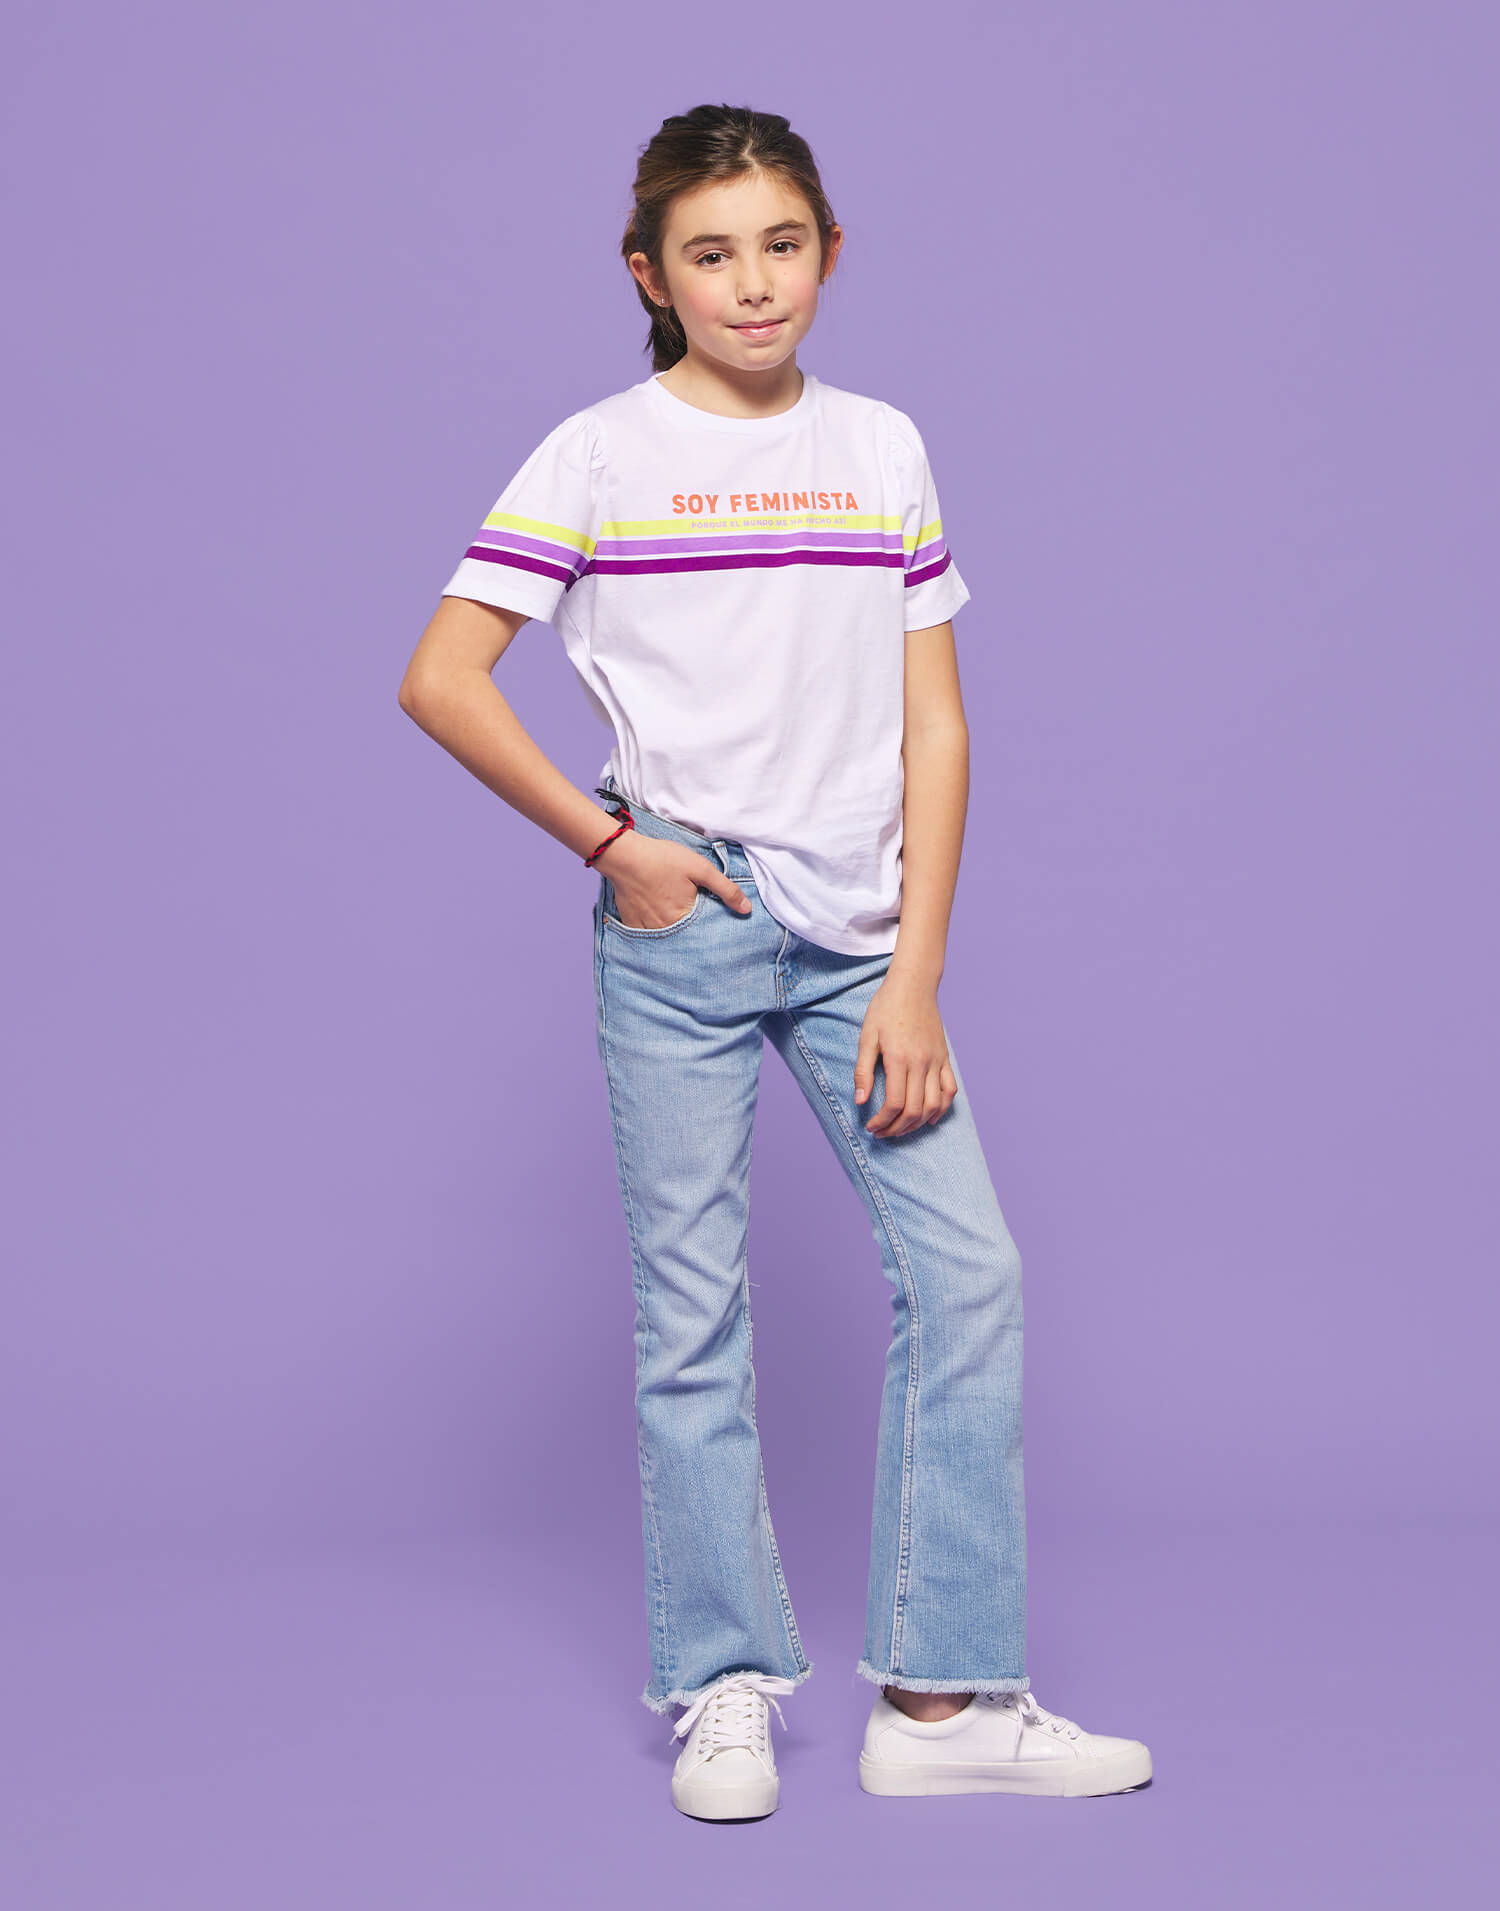 Camiseta infantil 'Soy feminista porque el mundo me hizo así'